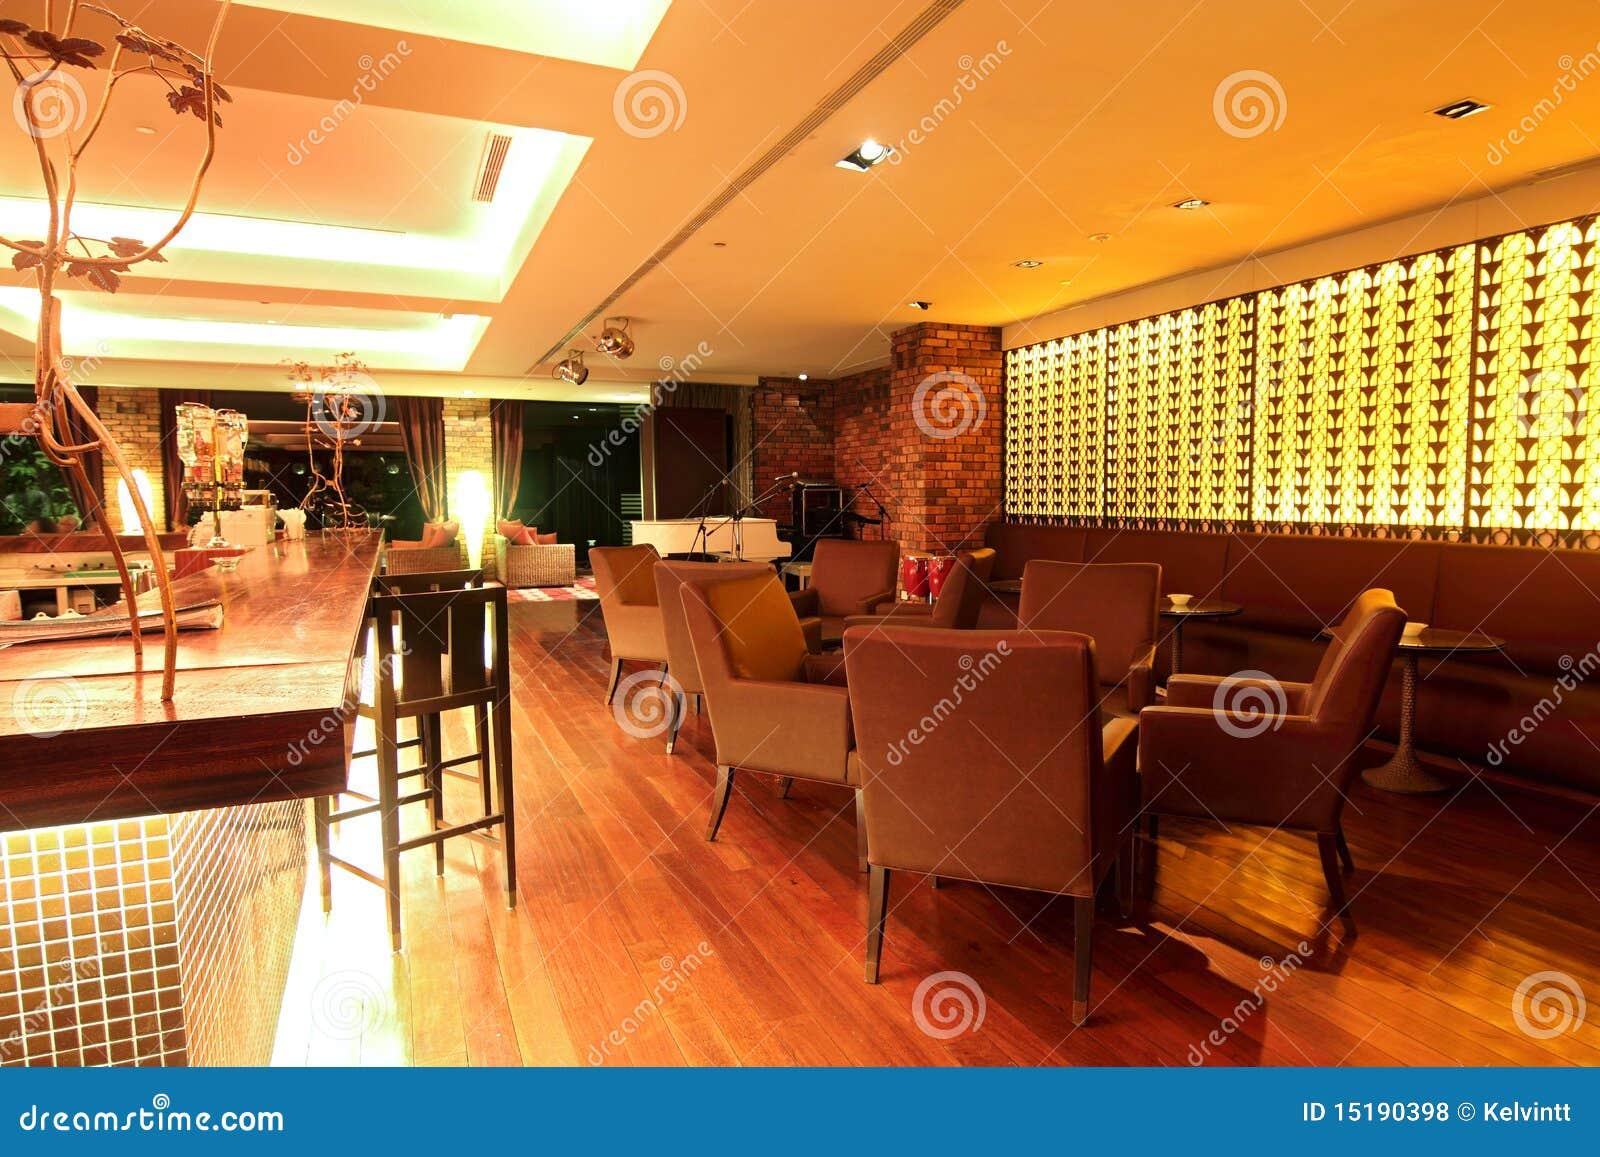 A Sample Cocktail Bar Business Plan Template